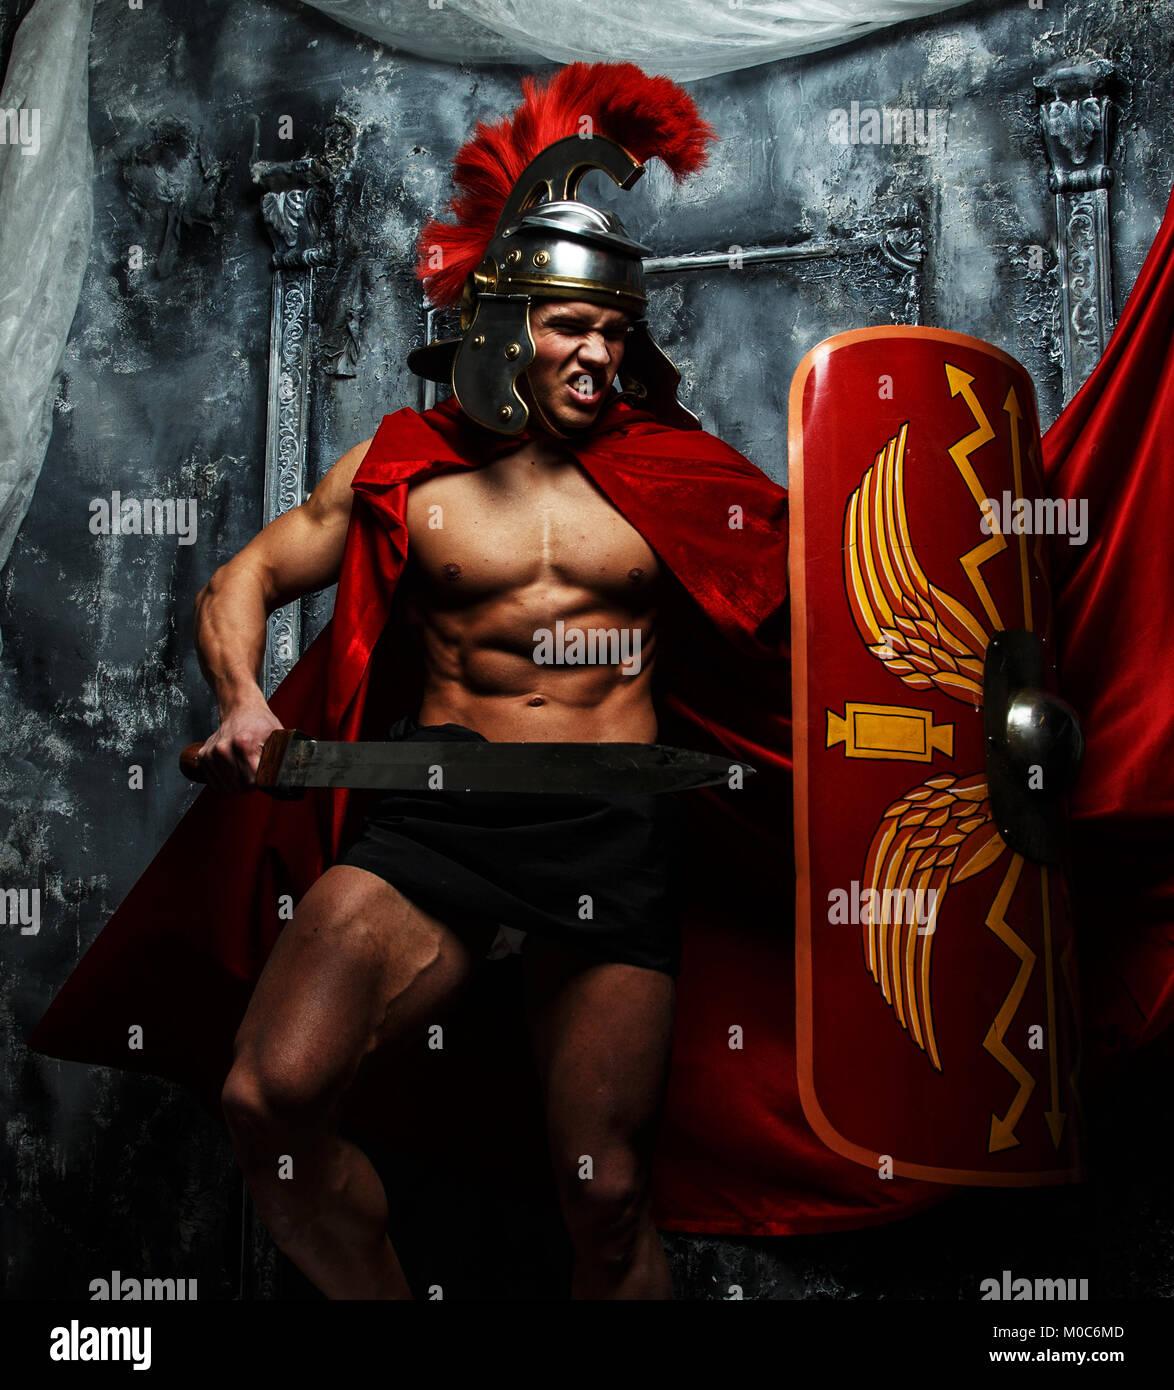 Muscular warrior attacks his enemies - Stock Image